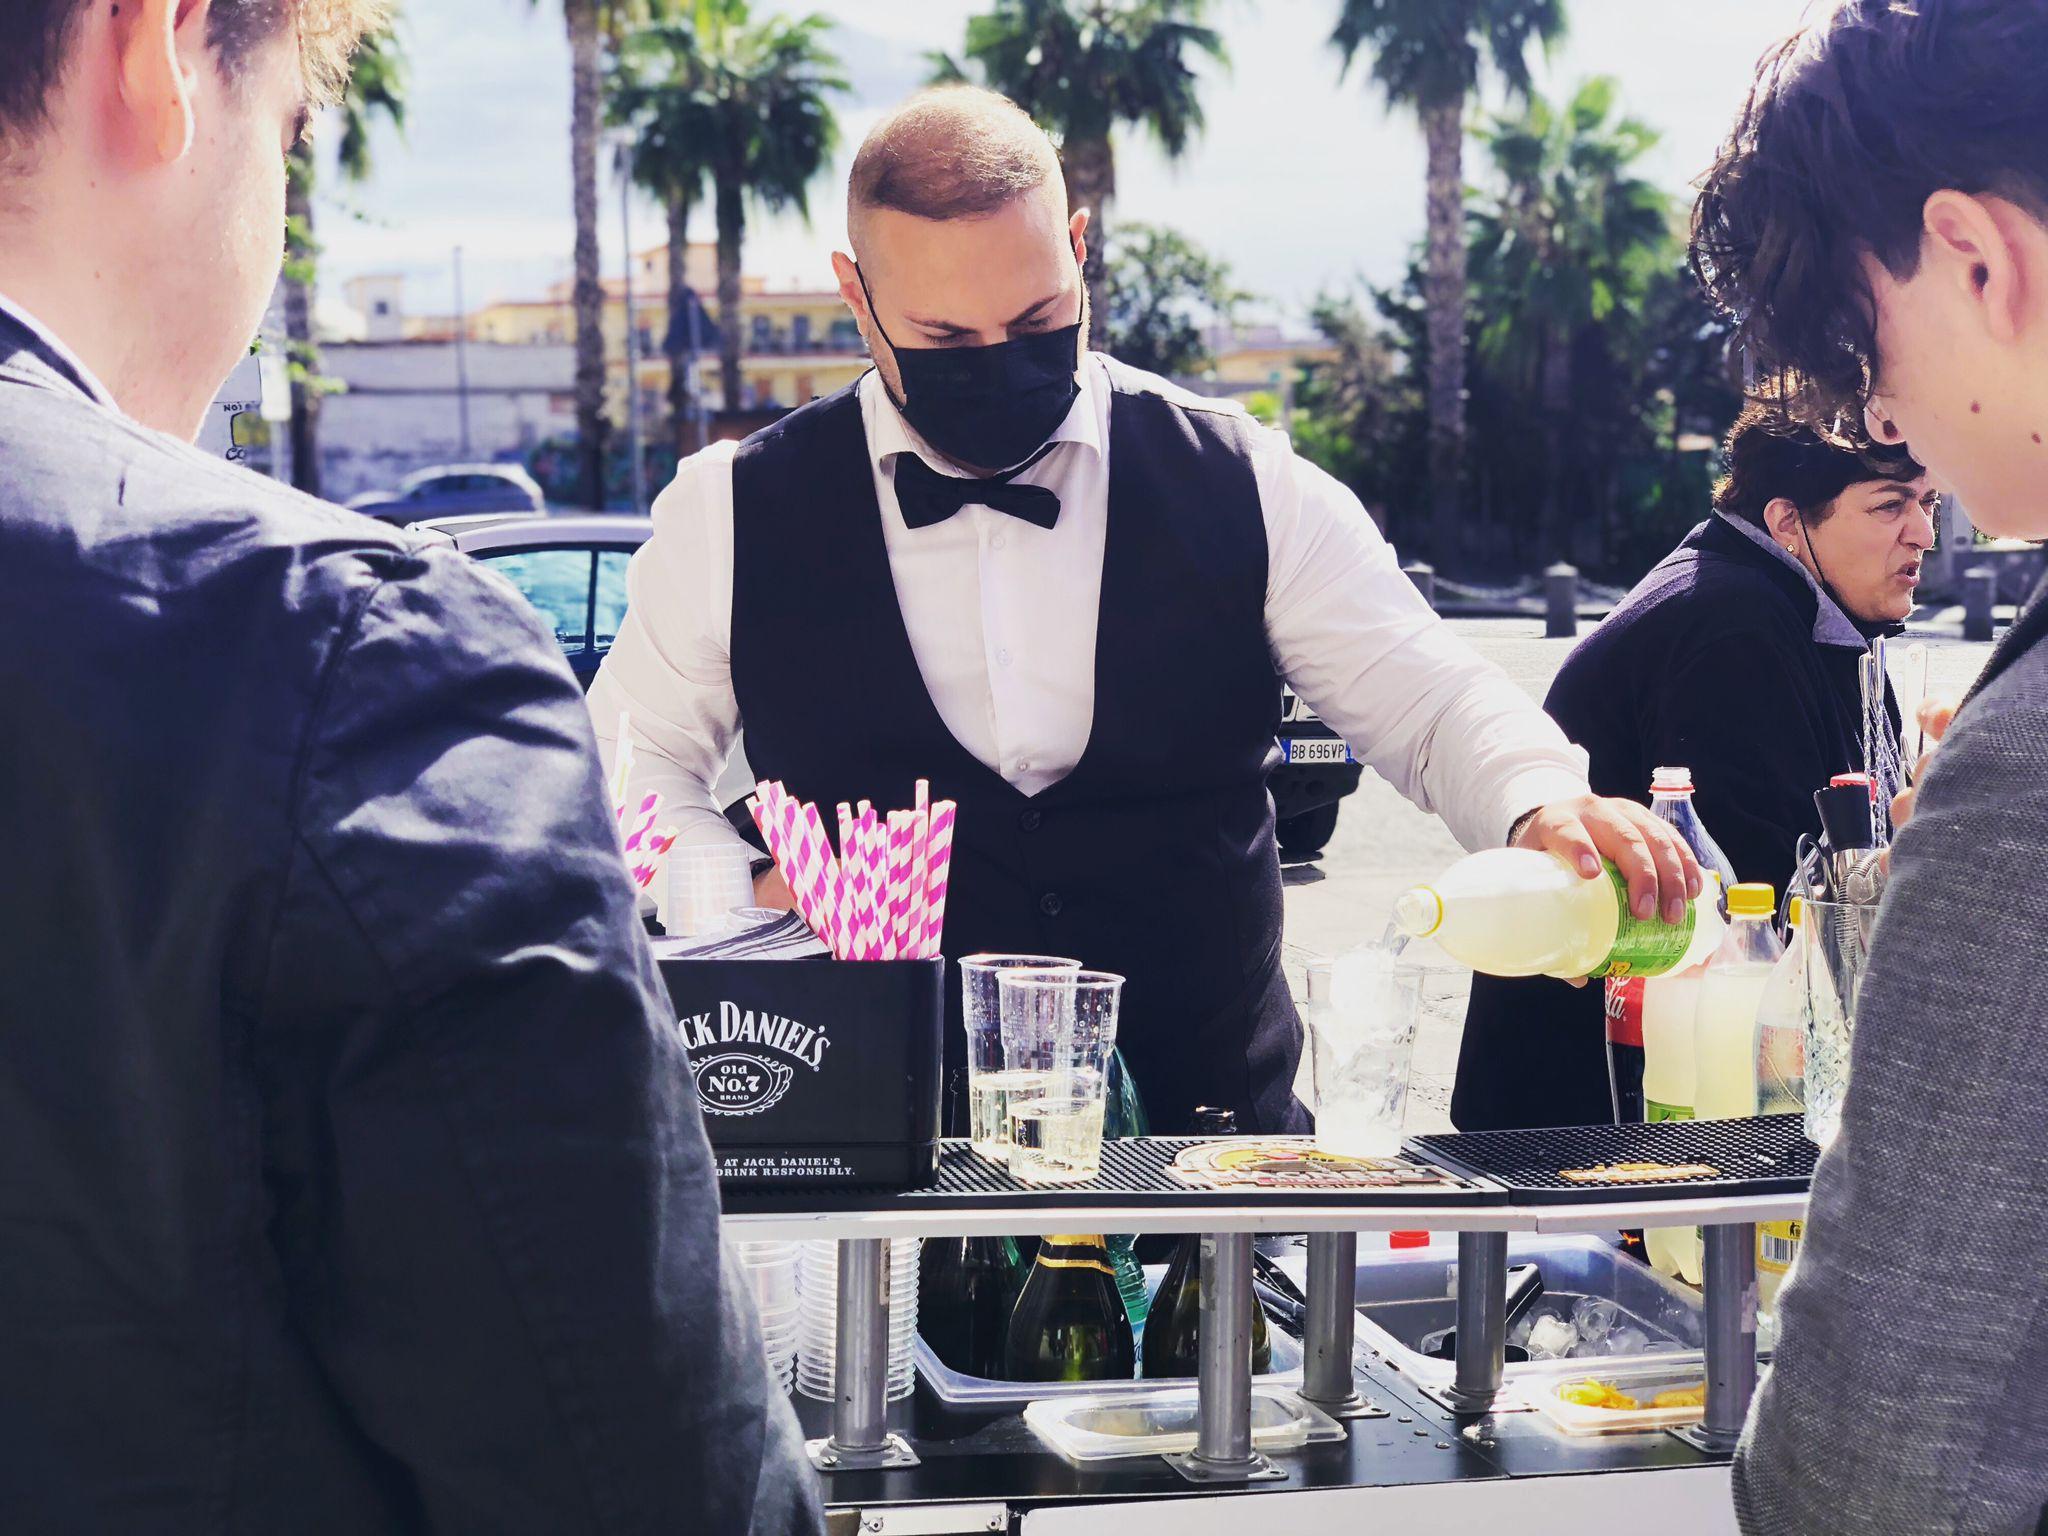 Barman catering